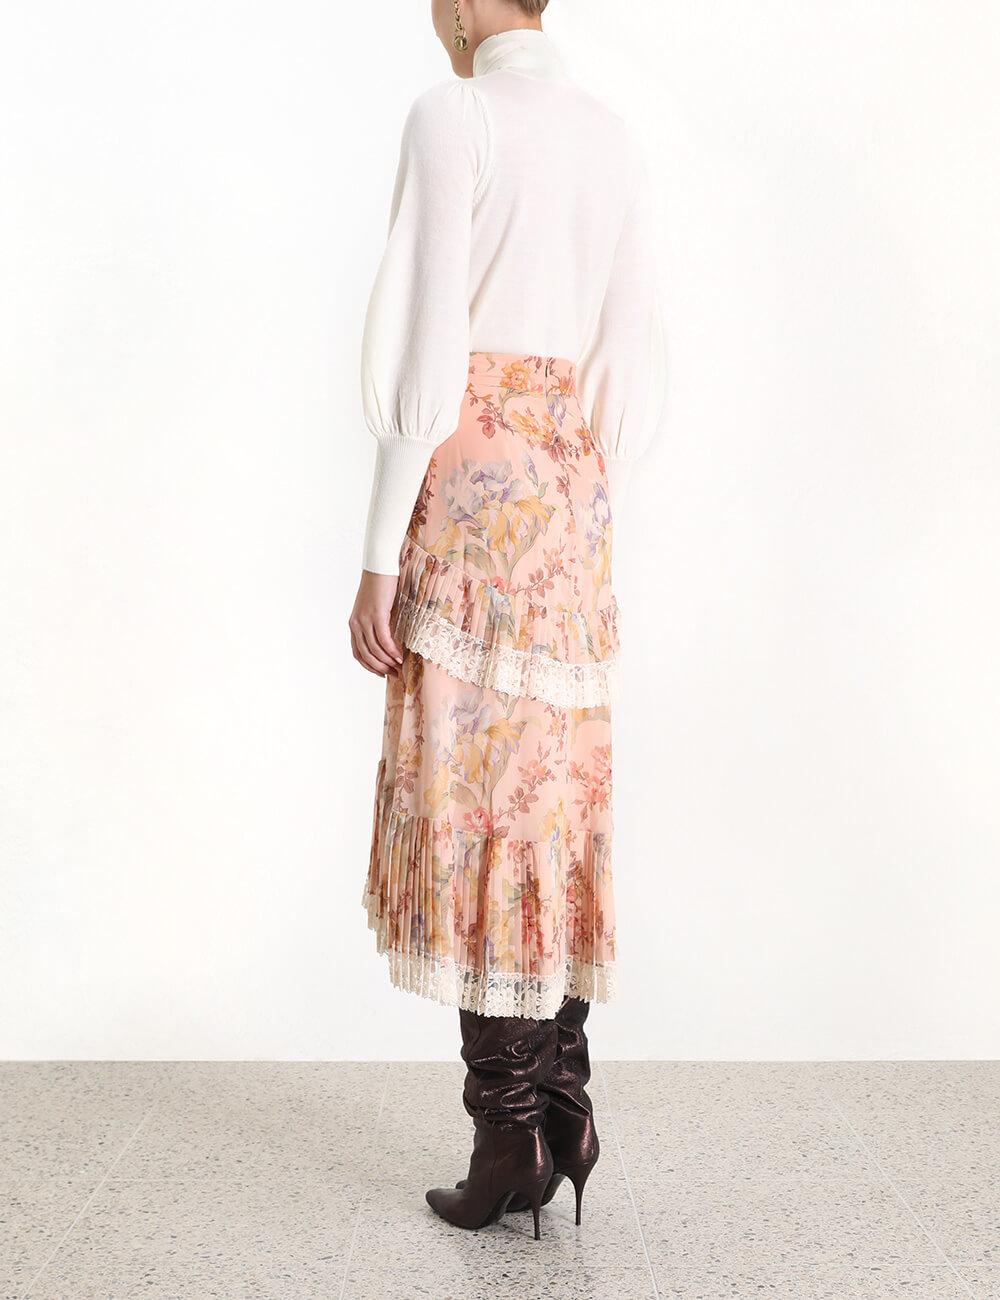 Espionage Pleat Frill Skirt